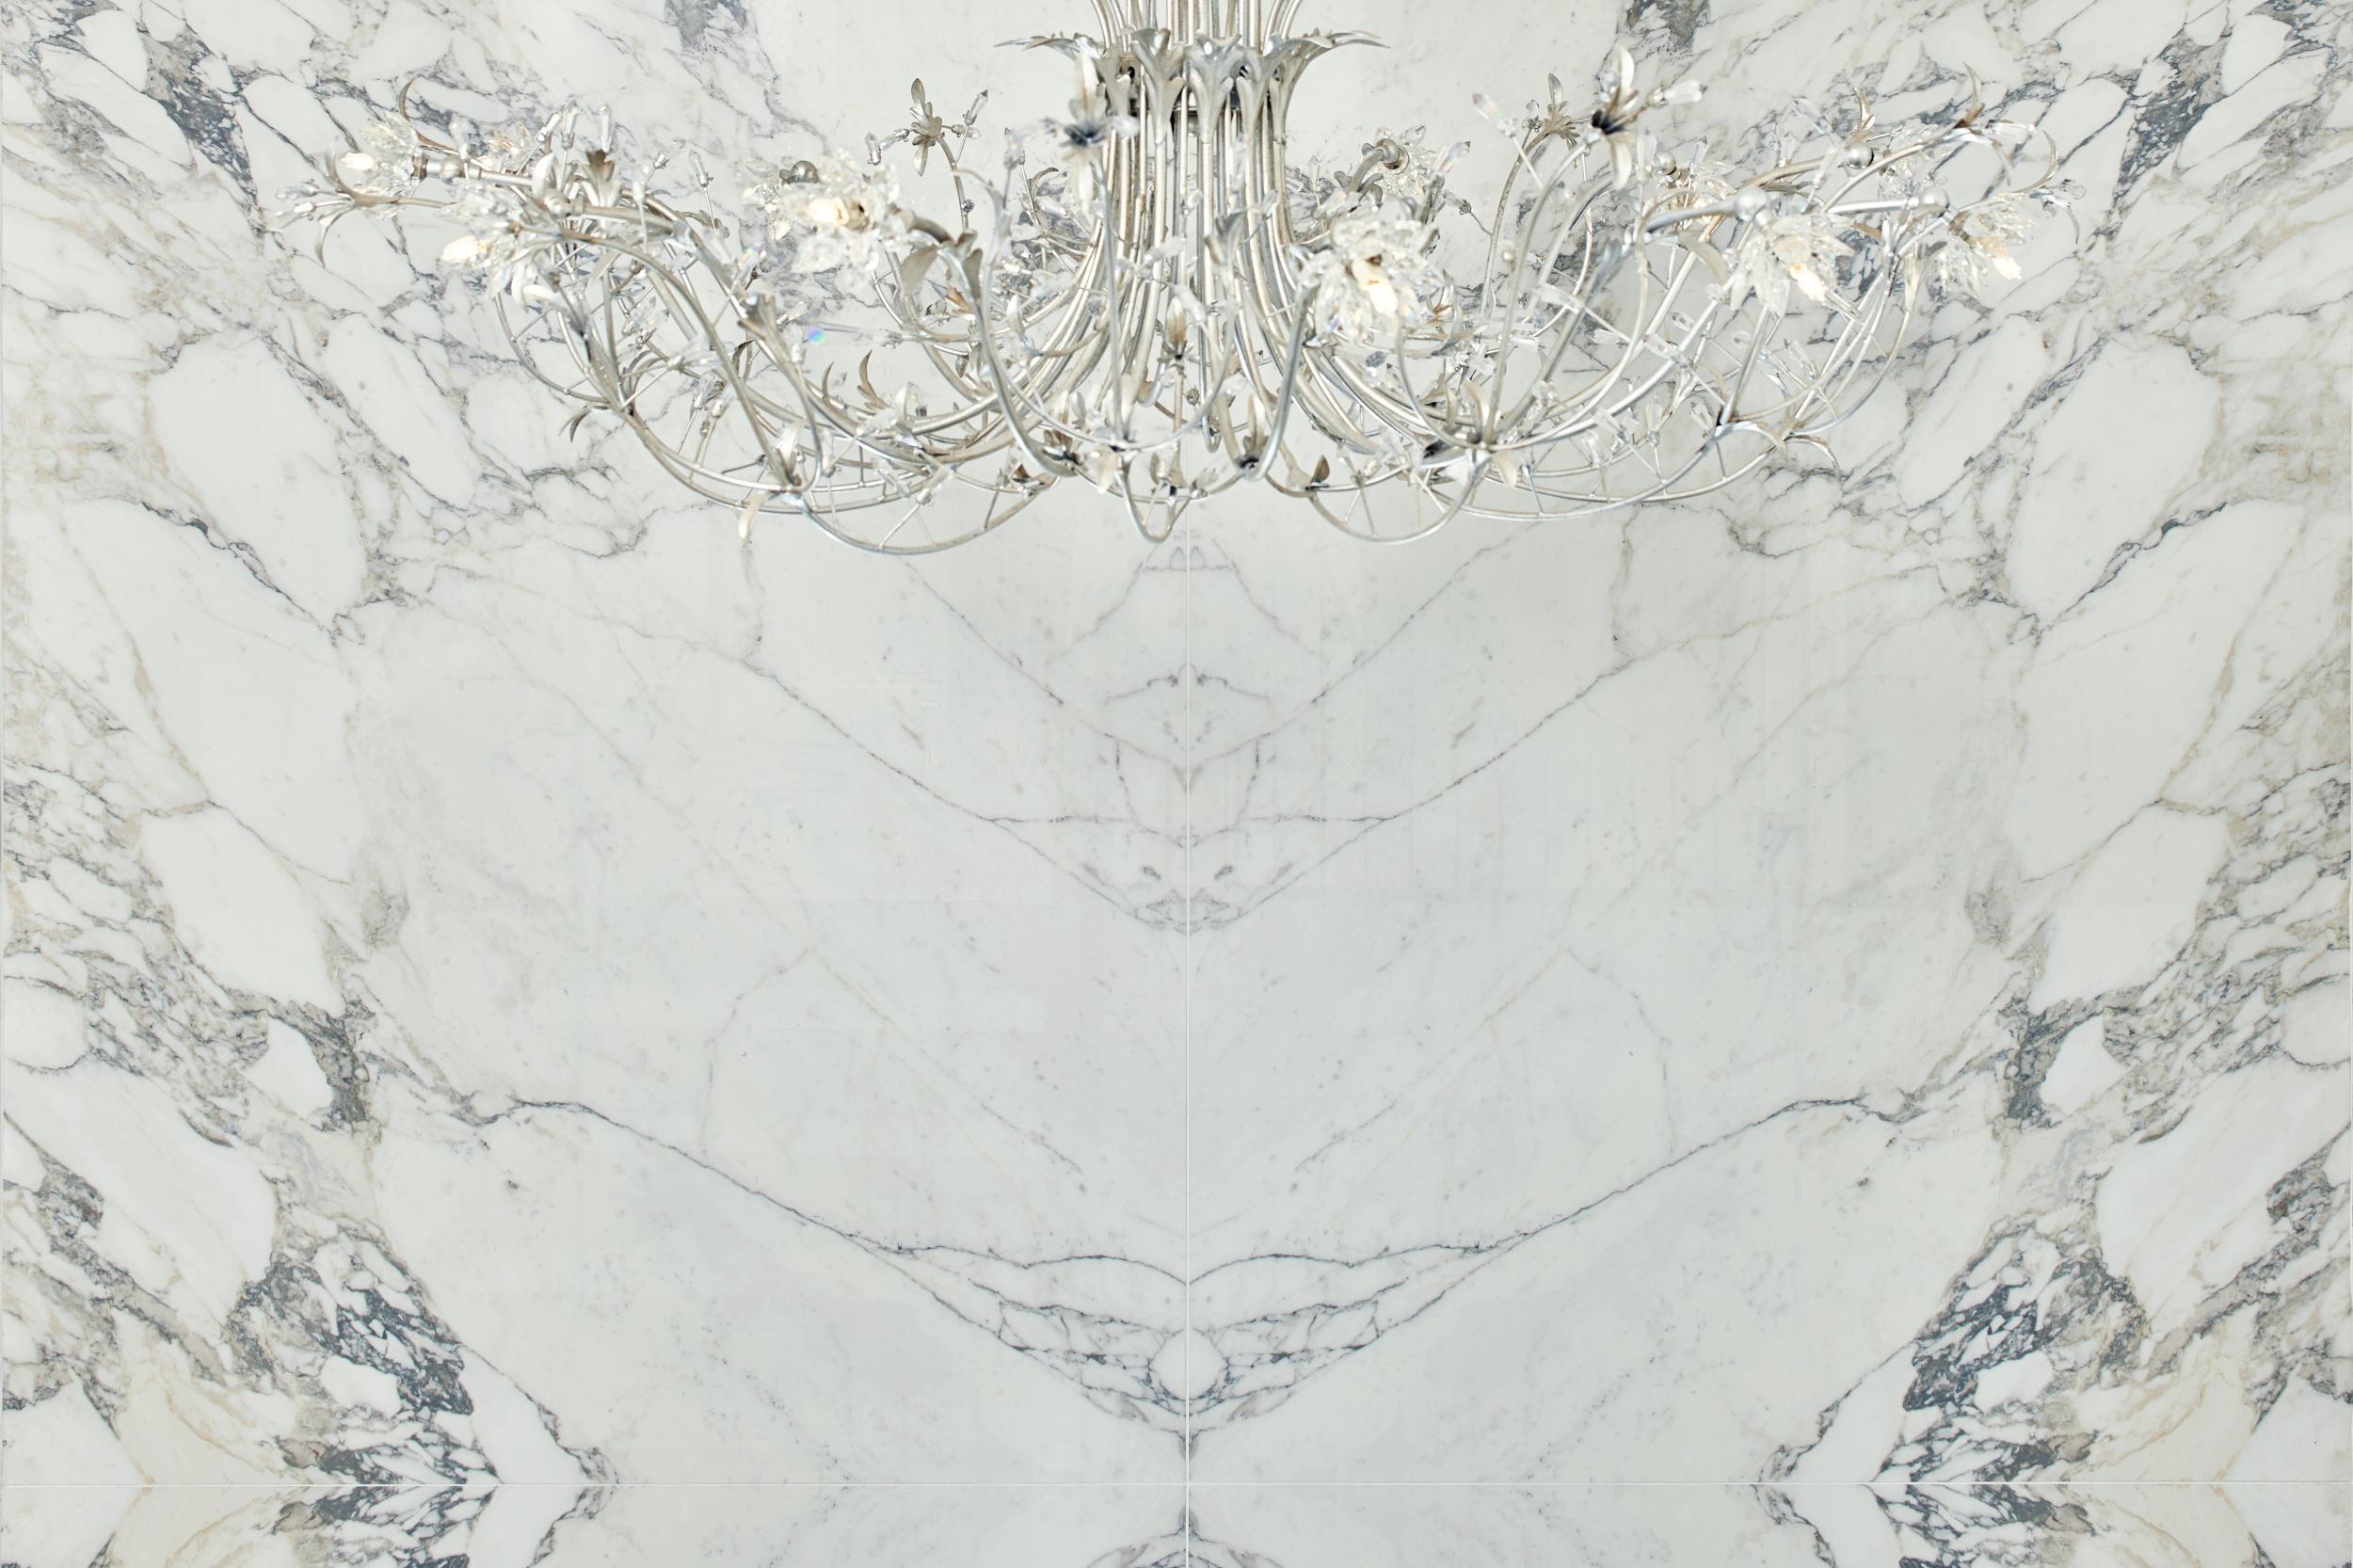 porcelain tile images: Stone Sense range high quality photo